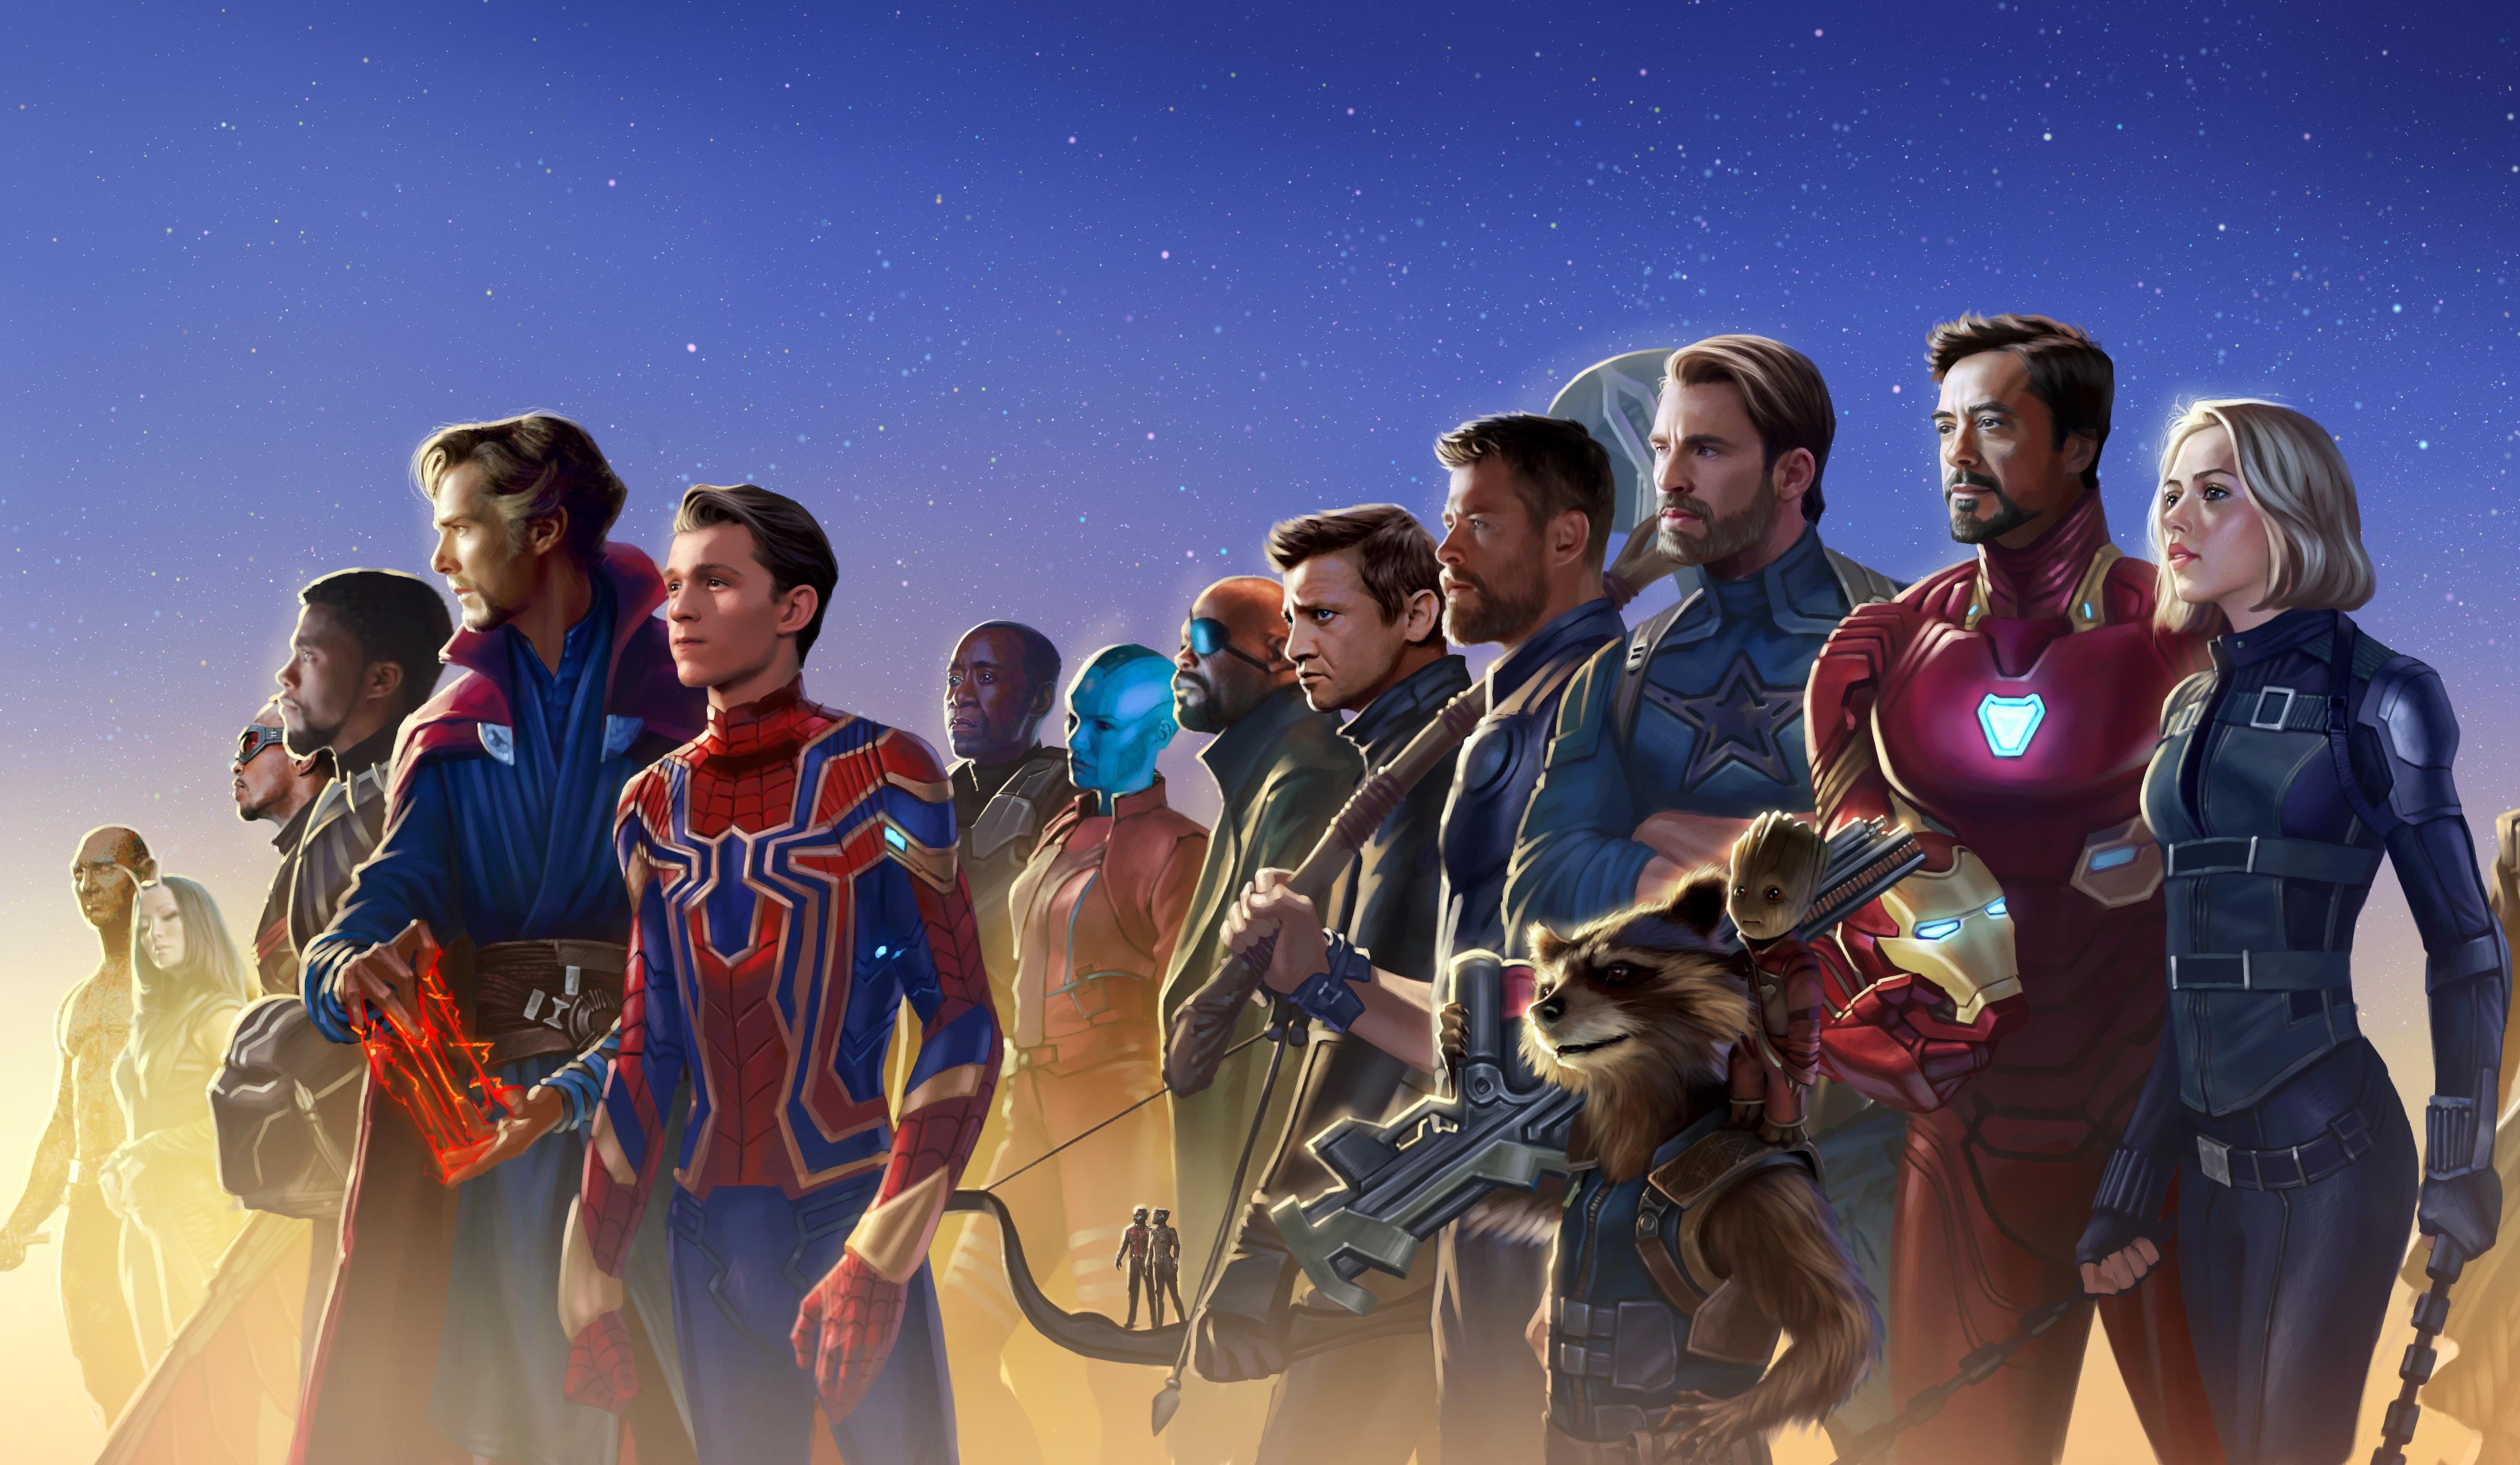 2048x2048 The Incredibles 2 Movie 2018 Ipad Air Hd 4k: 2048x2048 Avengers Infinity War 5k Artwork Ipad Air HD 4k